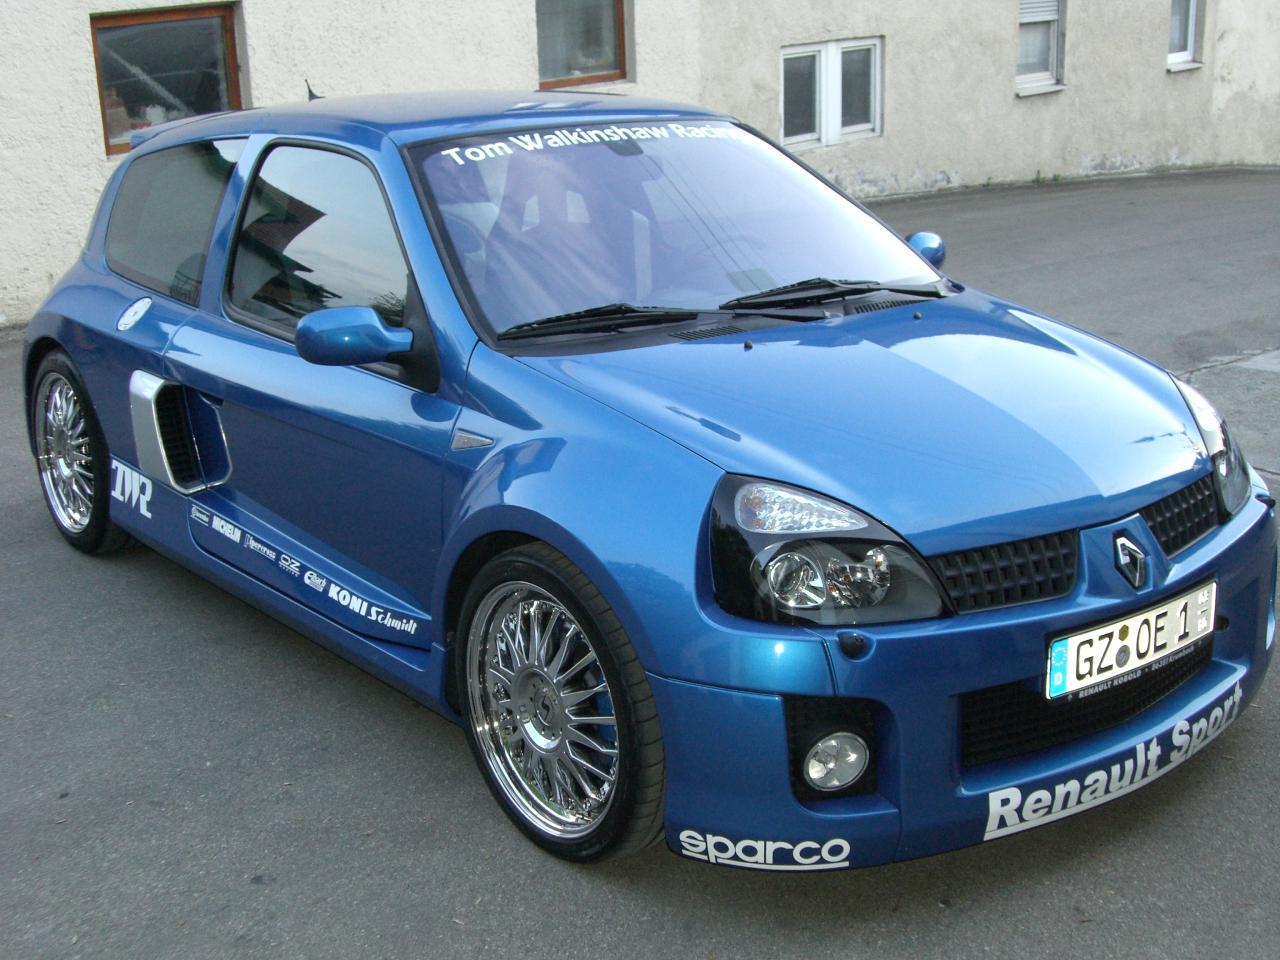 Renault Clio V6 Cc Line 3 Tlg 18 Zoll Renault